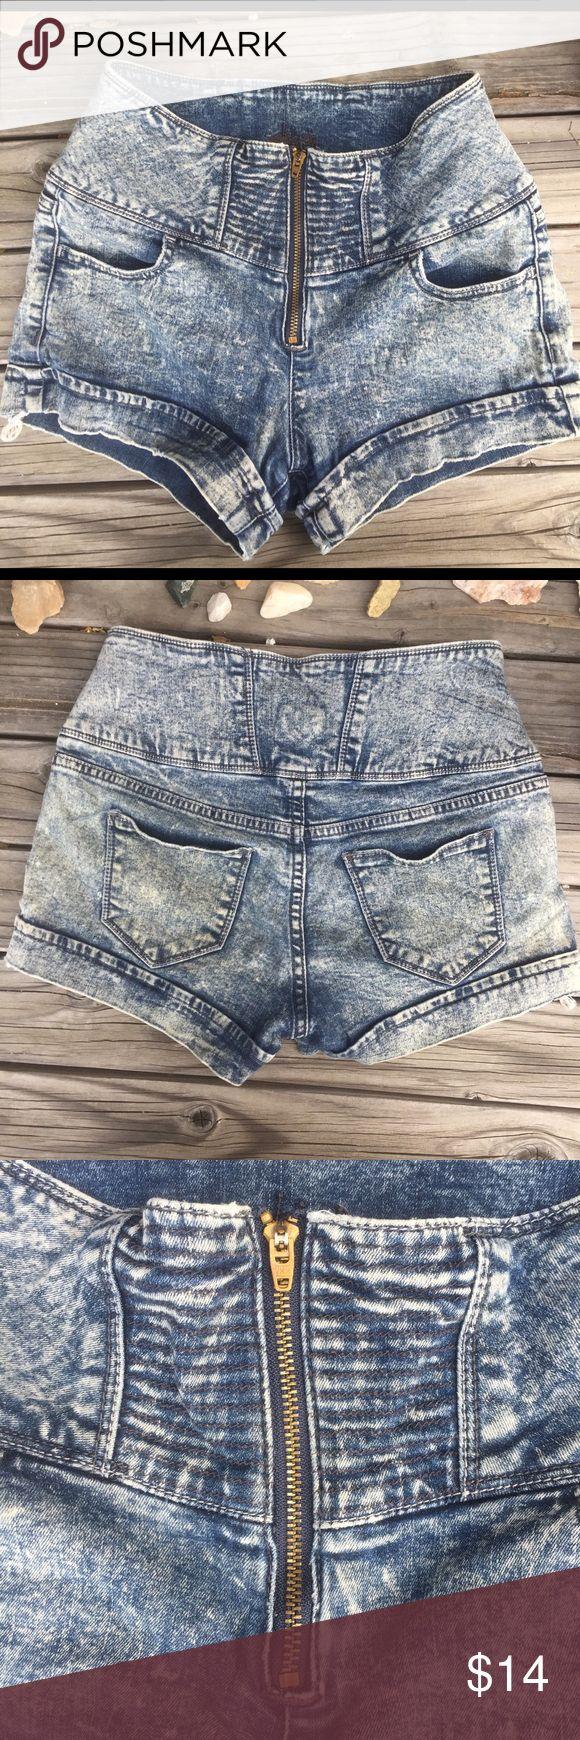 VTG HIGH WAIST BLEACHED MINI SHORTS SZ S VTG HIGH WAIST BLEACHED MINI SHORTS SZ S- zipper Front- acid wash- stretch- some fray at hem- very sexy on hugs curves! Vintage Shorts Jean Shorts